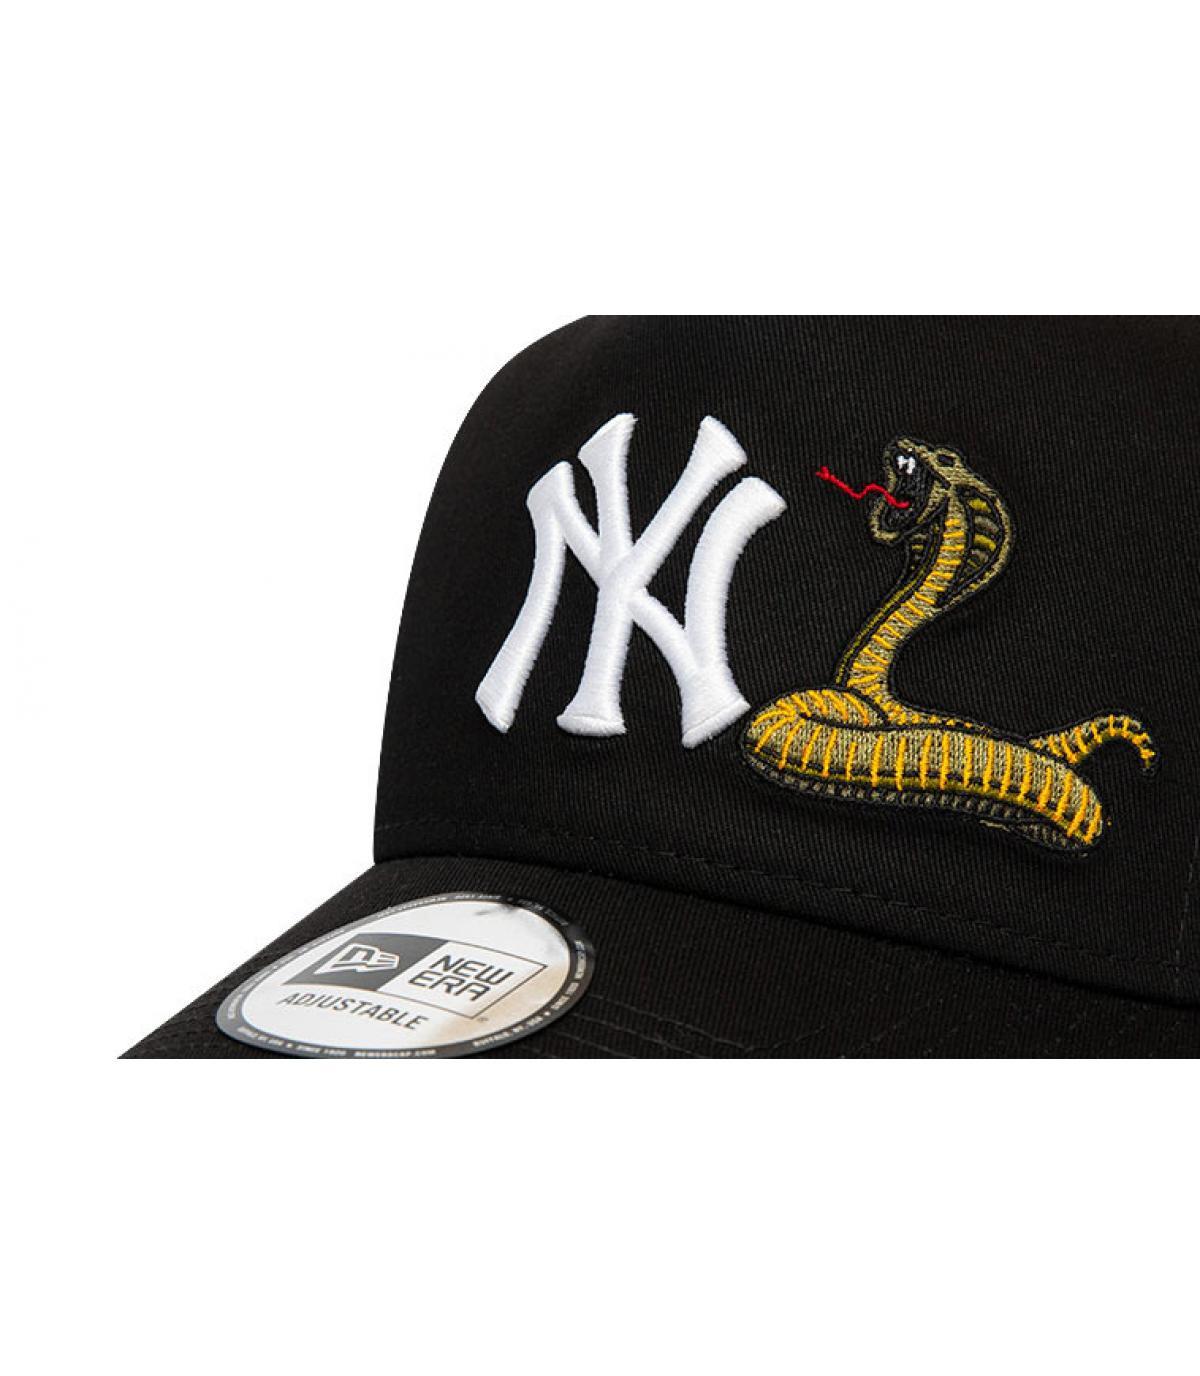 Détails Trucker MLB Twine NY black - image 3